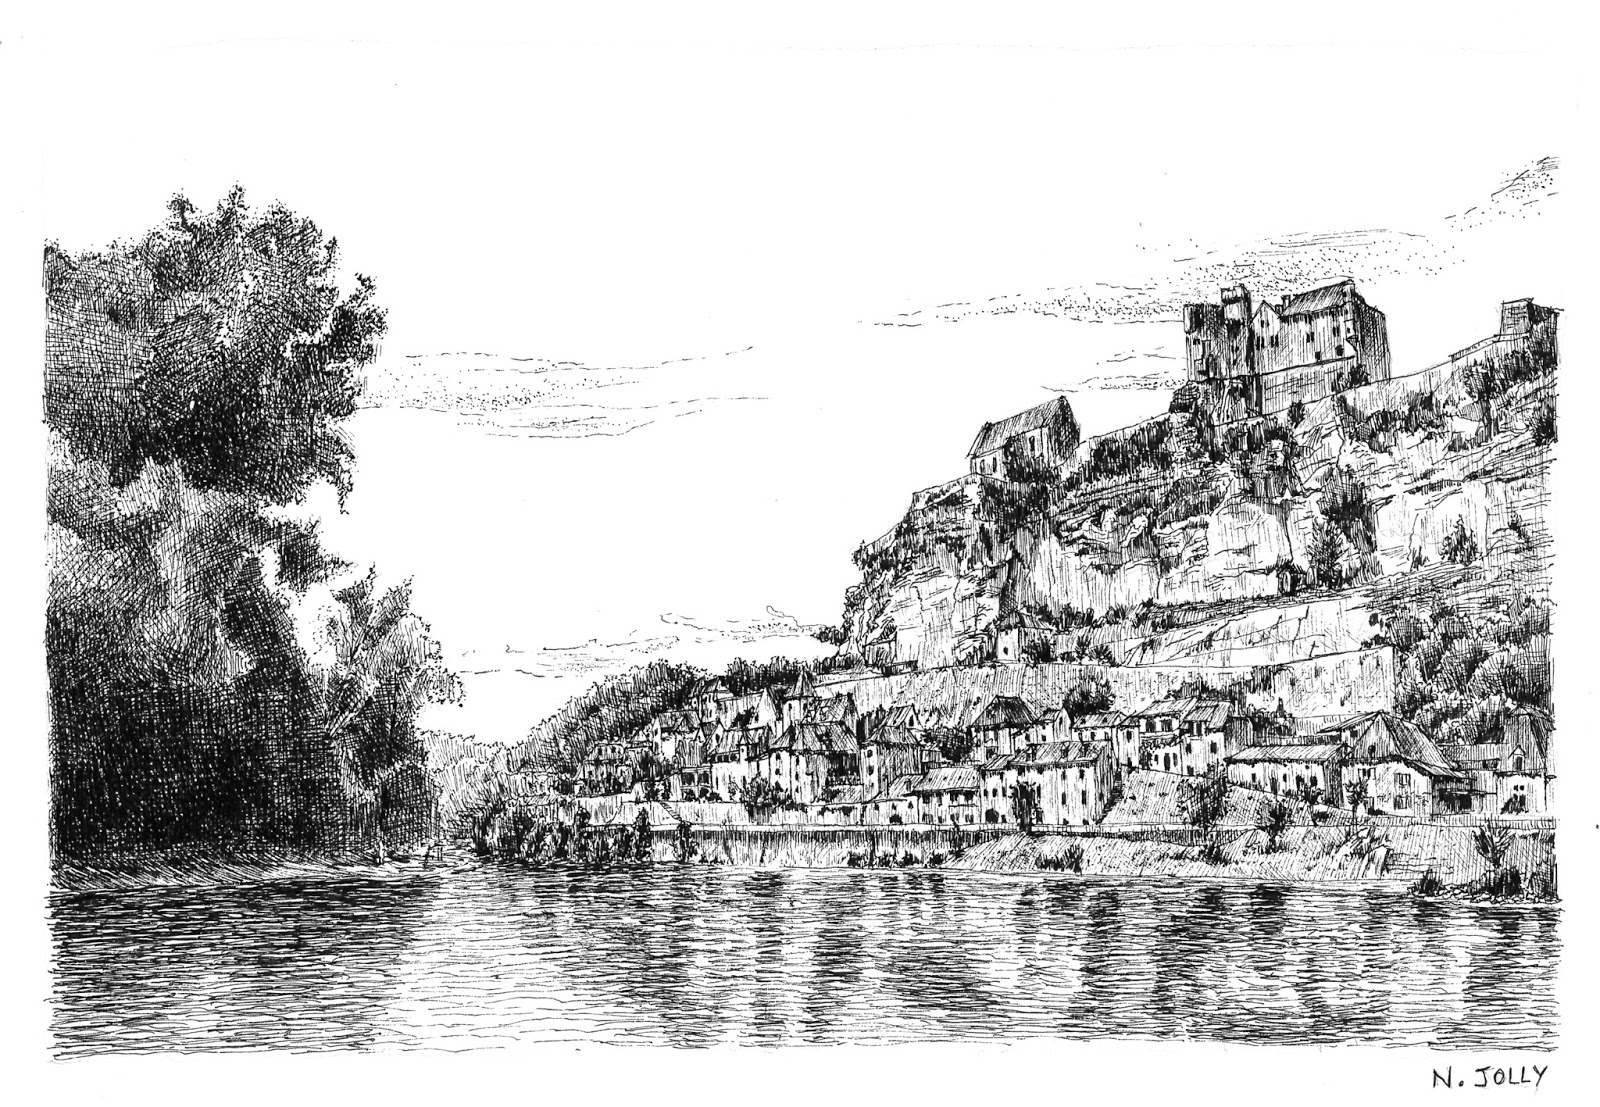 N jolly - Village dessin ...